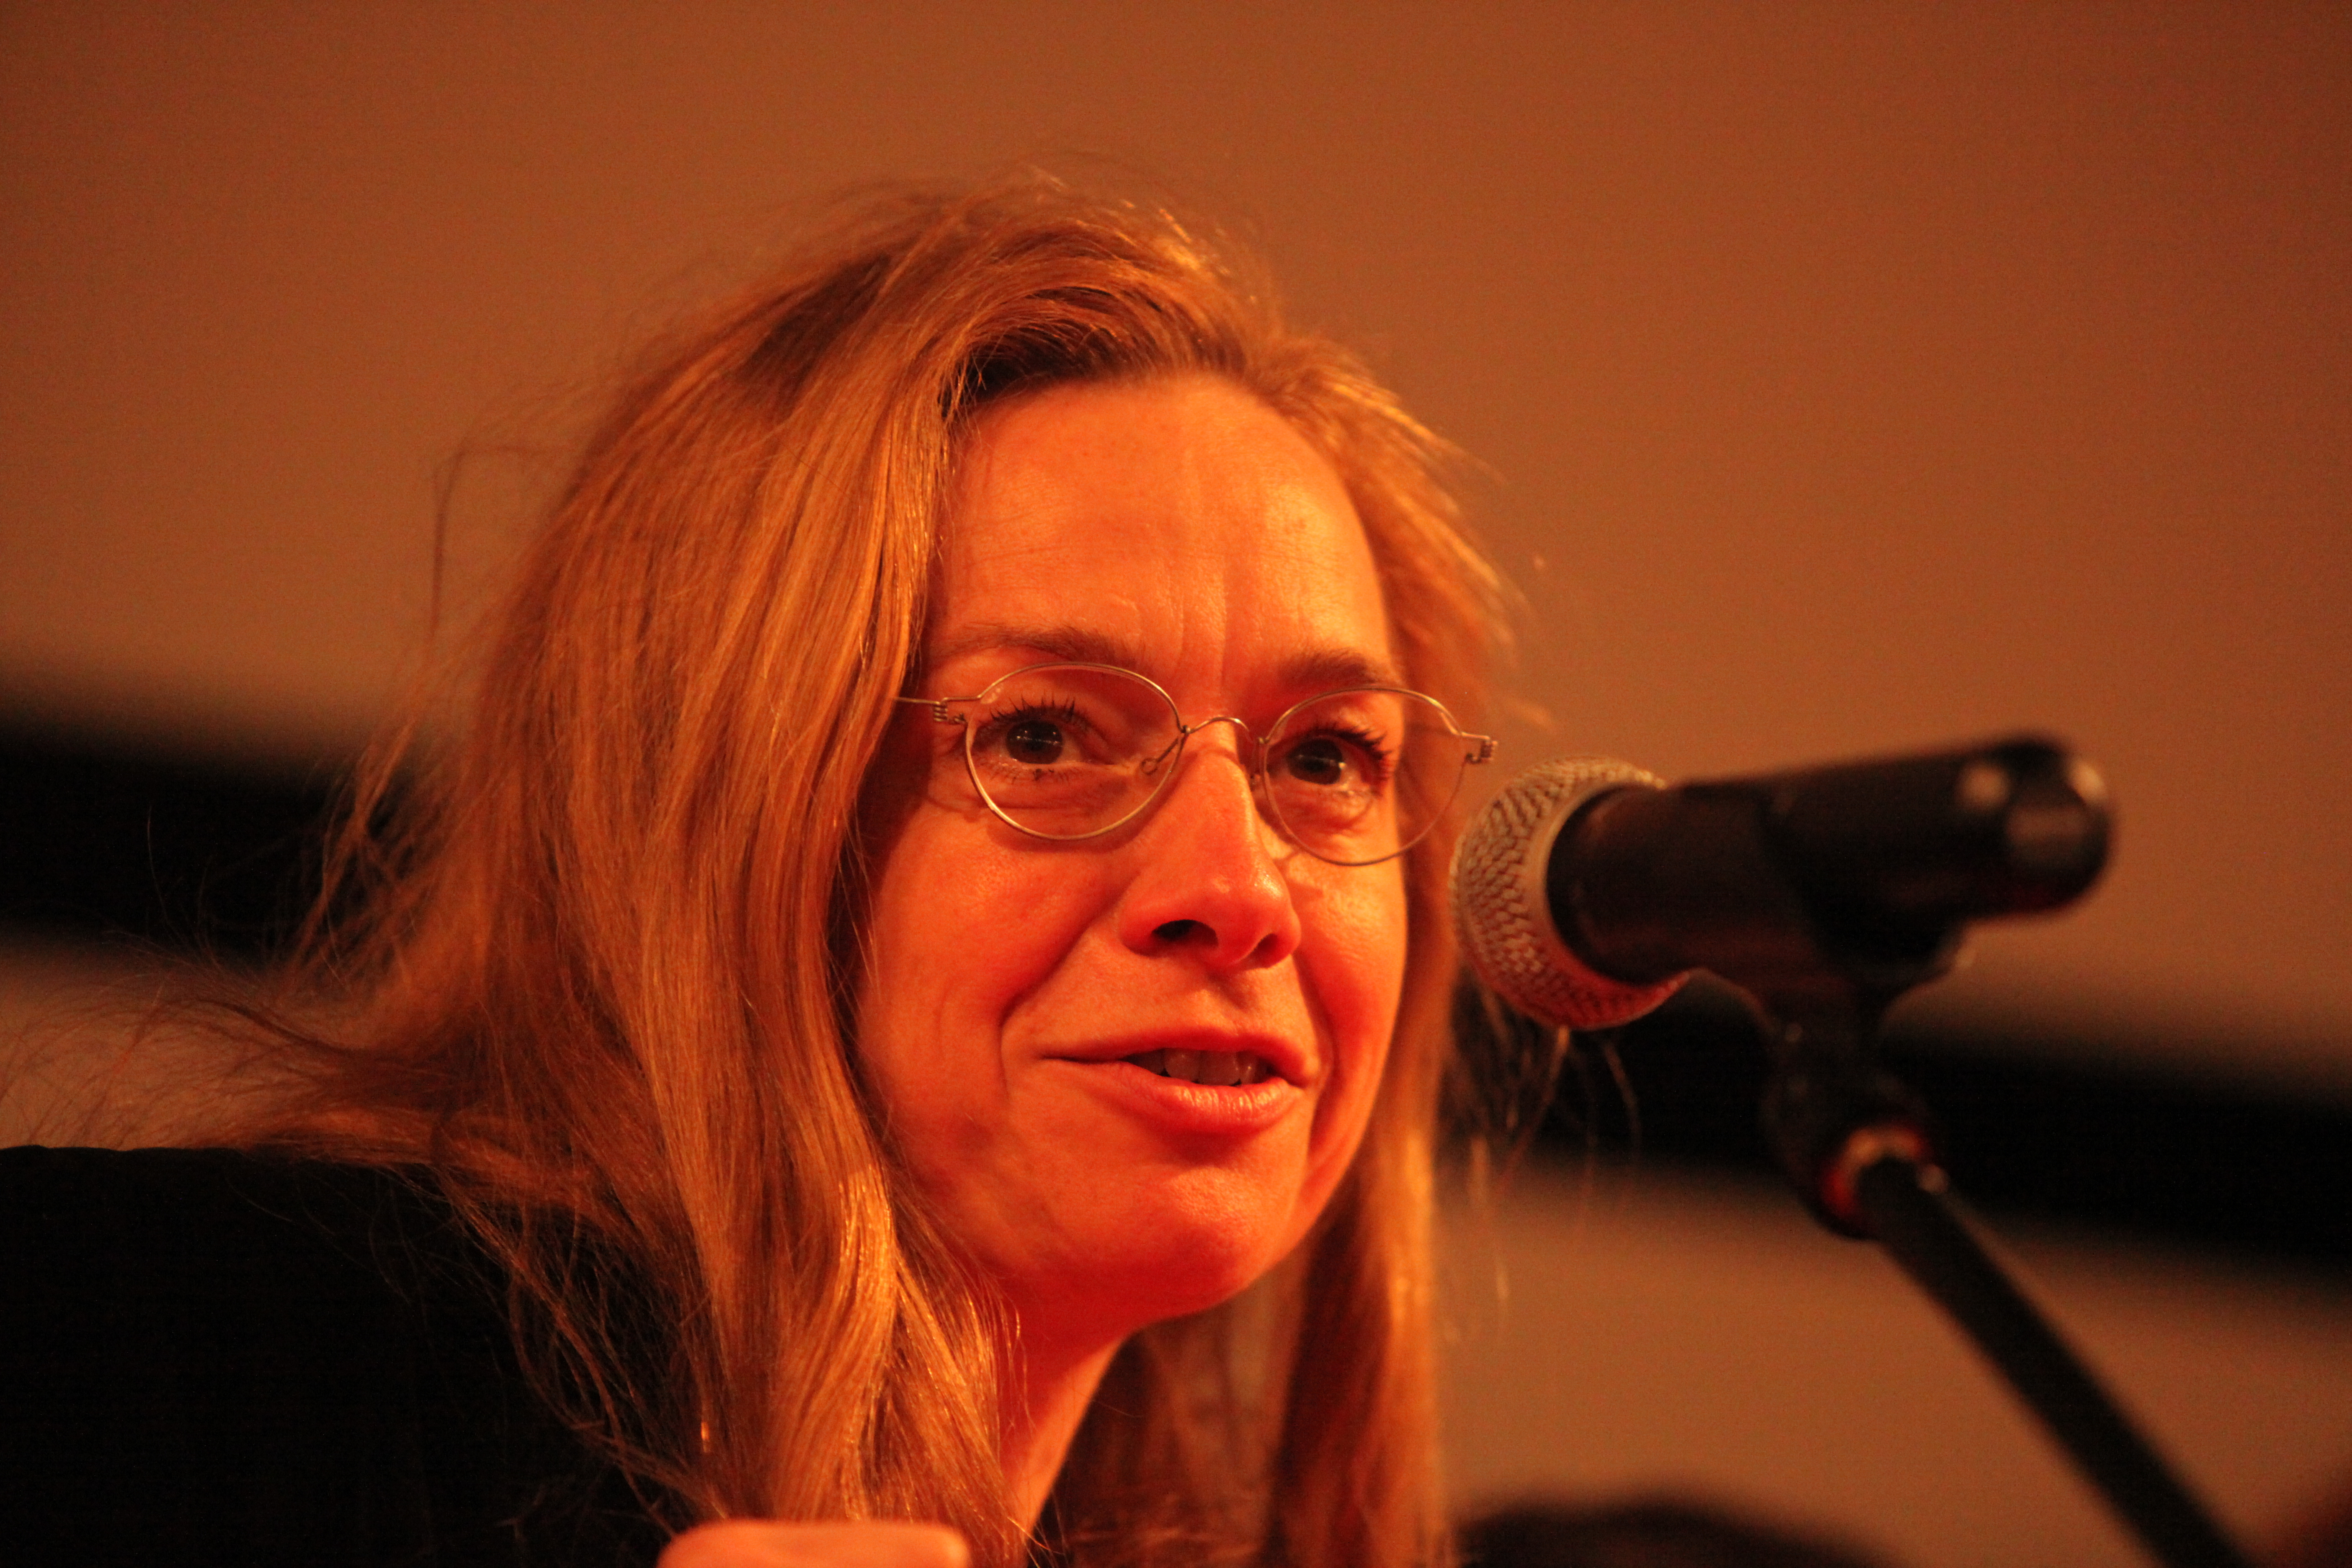 Andrea Sedláčková in 2014